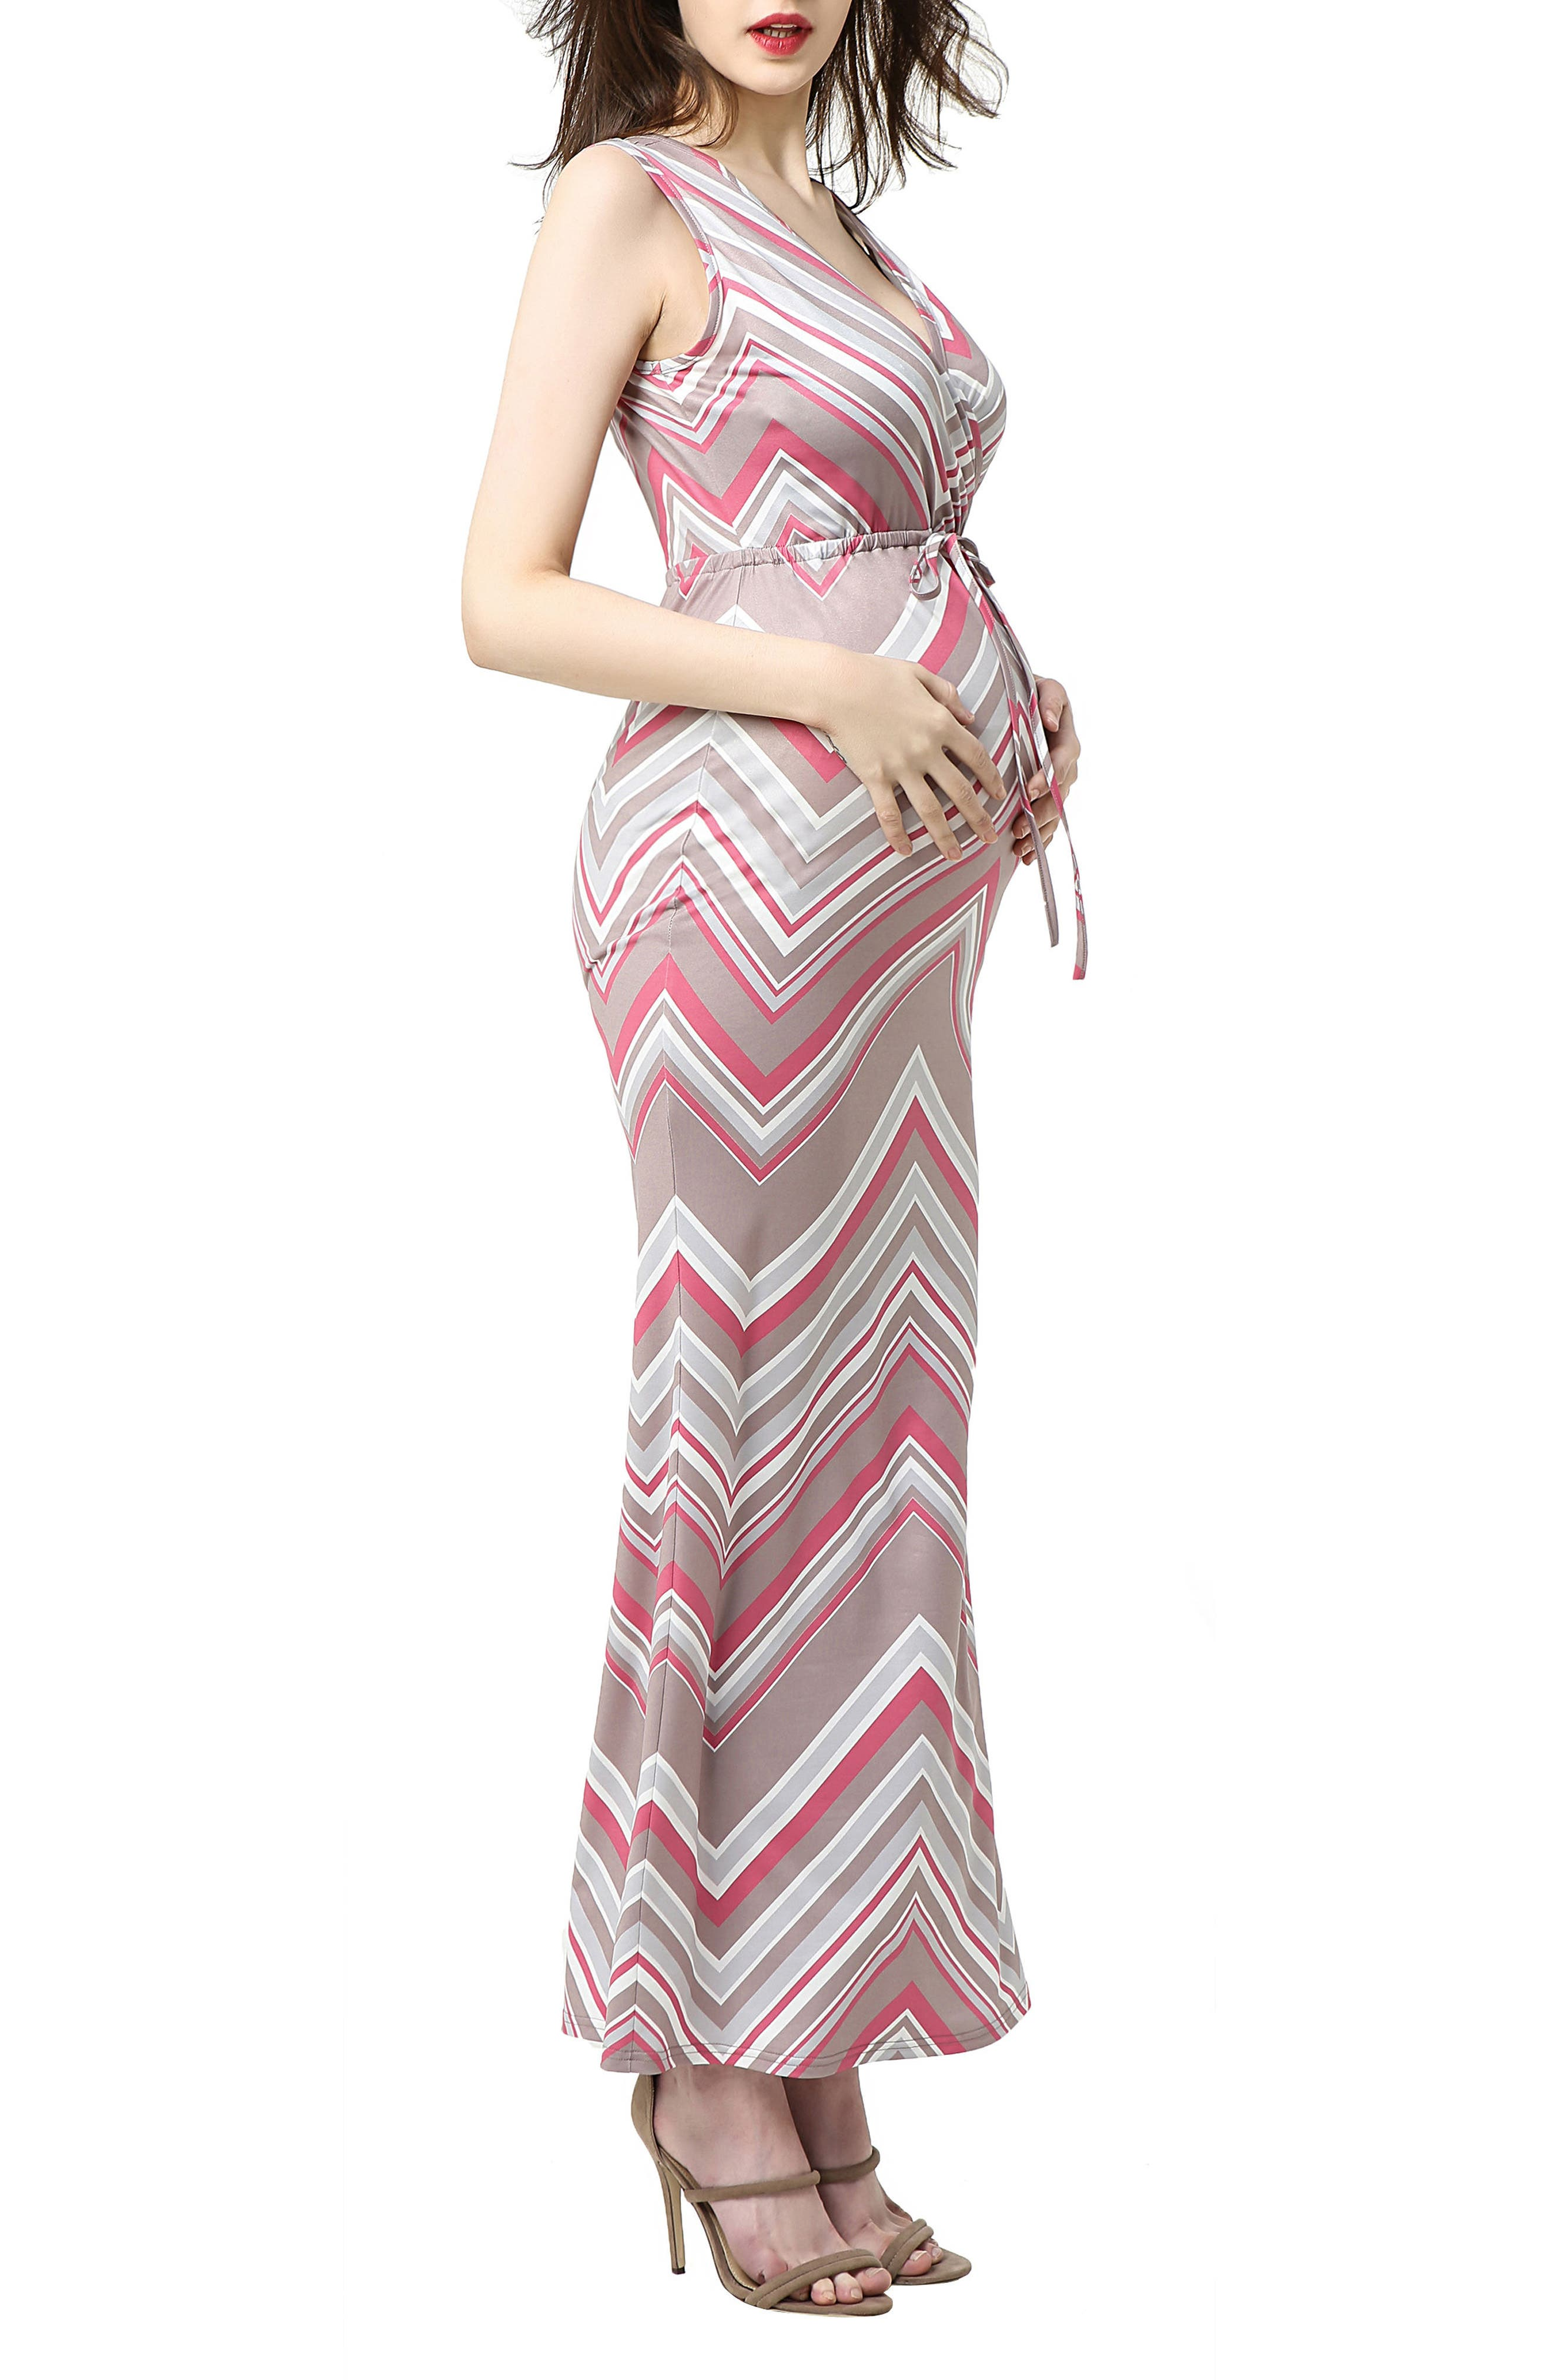 Natalie Chevron Print Maxi Maternity Dress,                             Alternate thumbnail 3, color,                             MULTICOLORED STRIPE